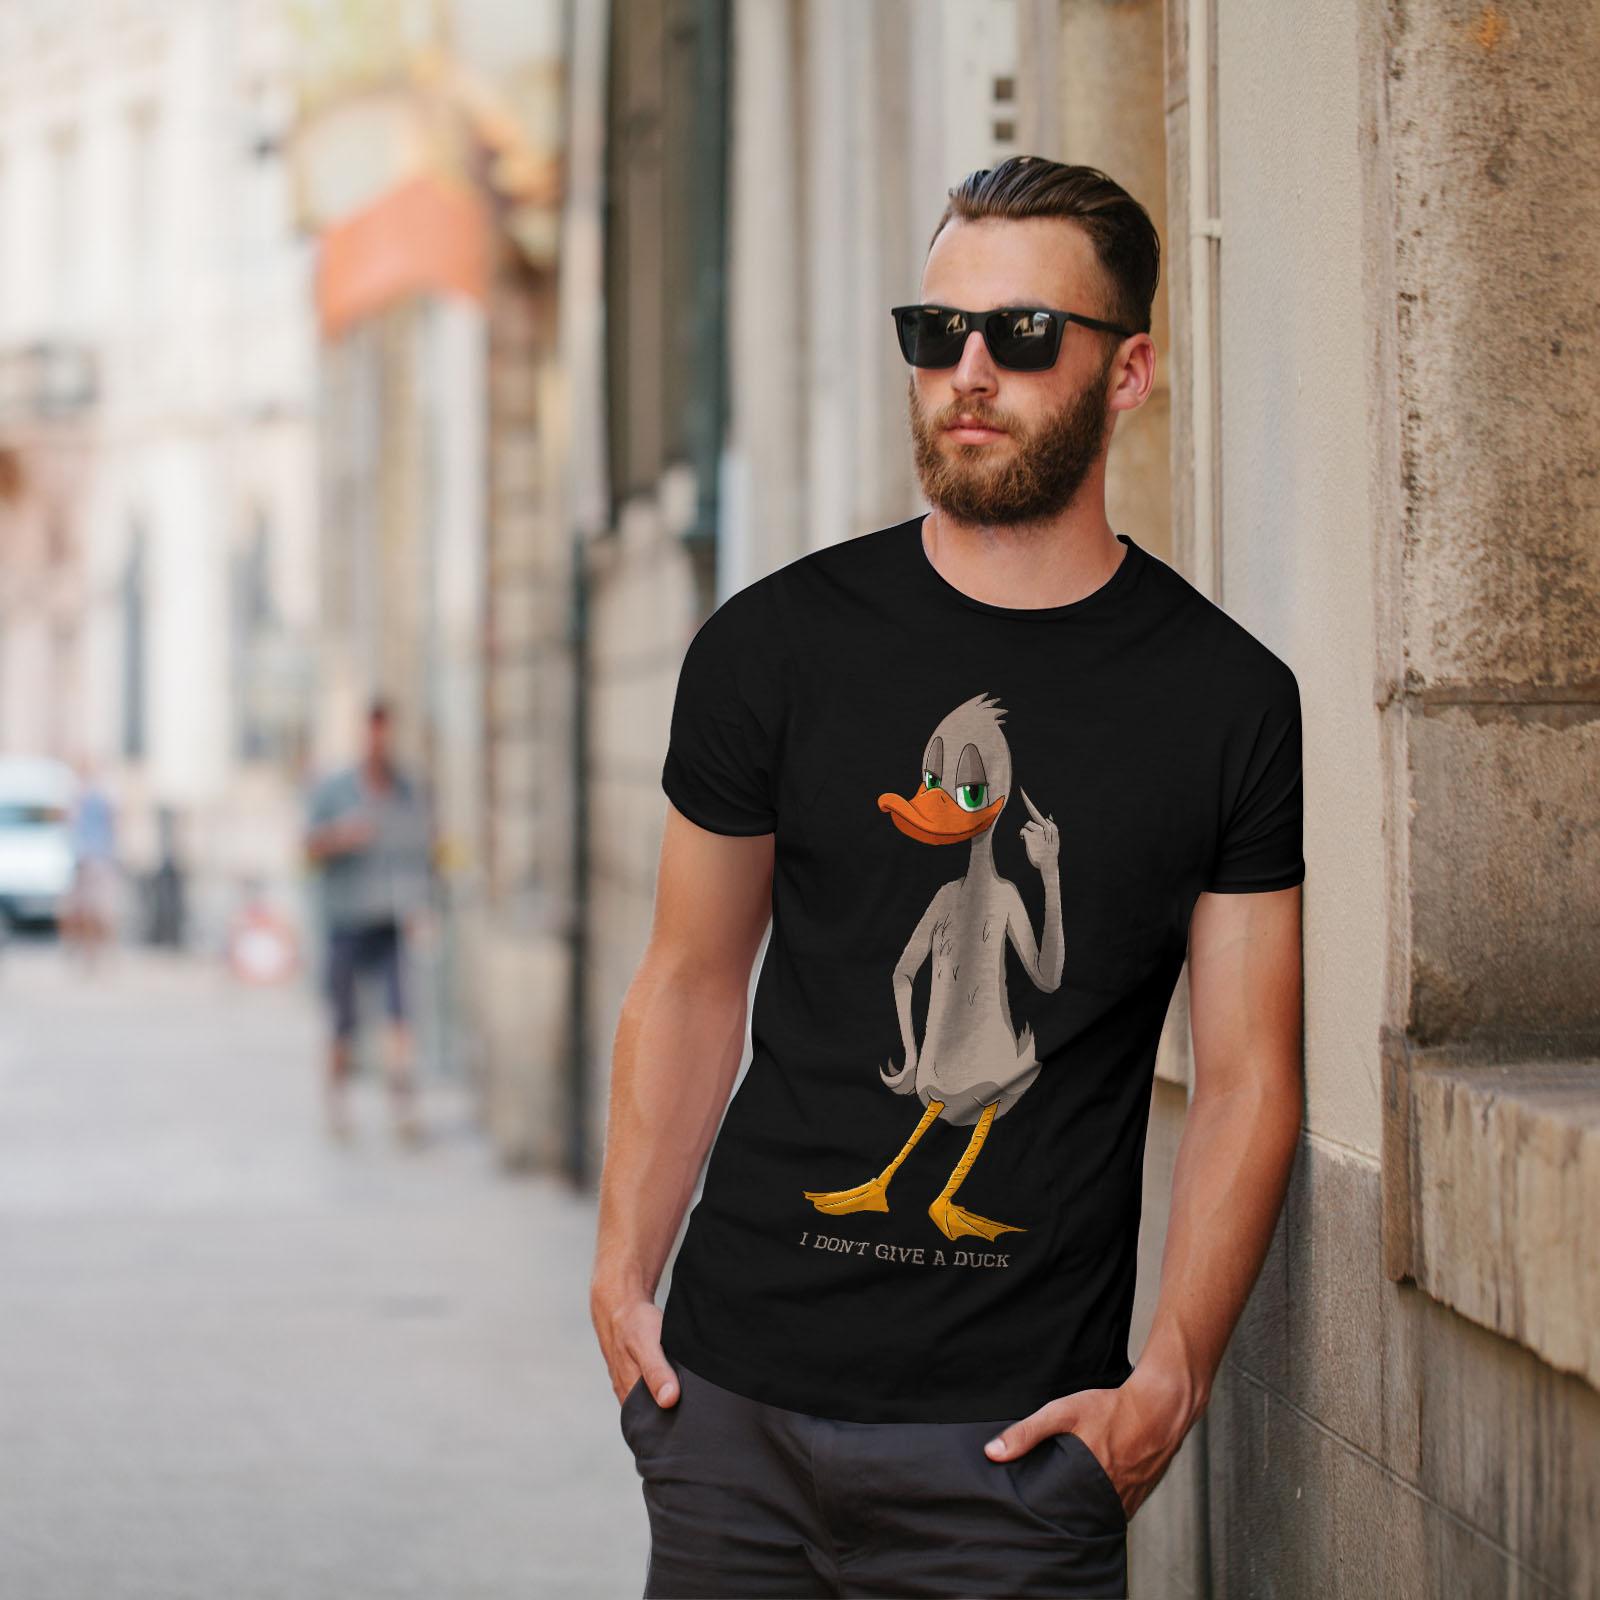 Cool Design graphique imprimé Tee Wellcoda dont donner un canard T-shirt homme